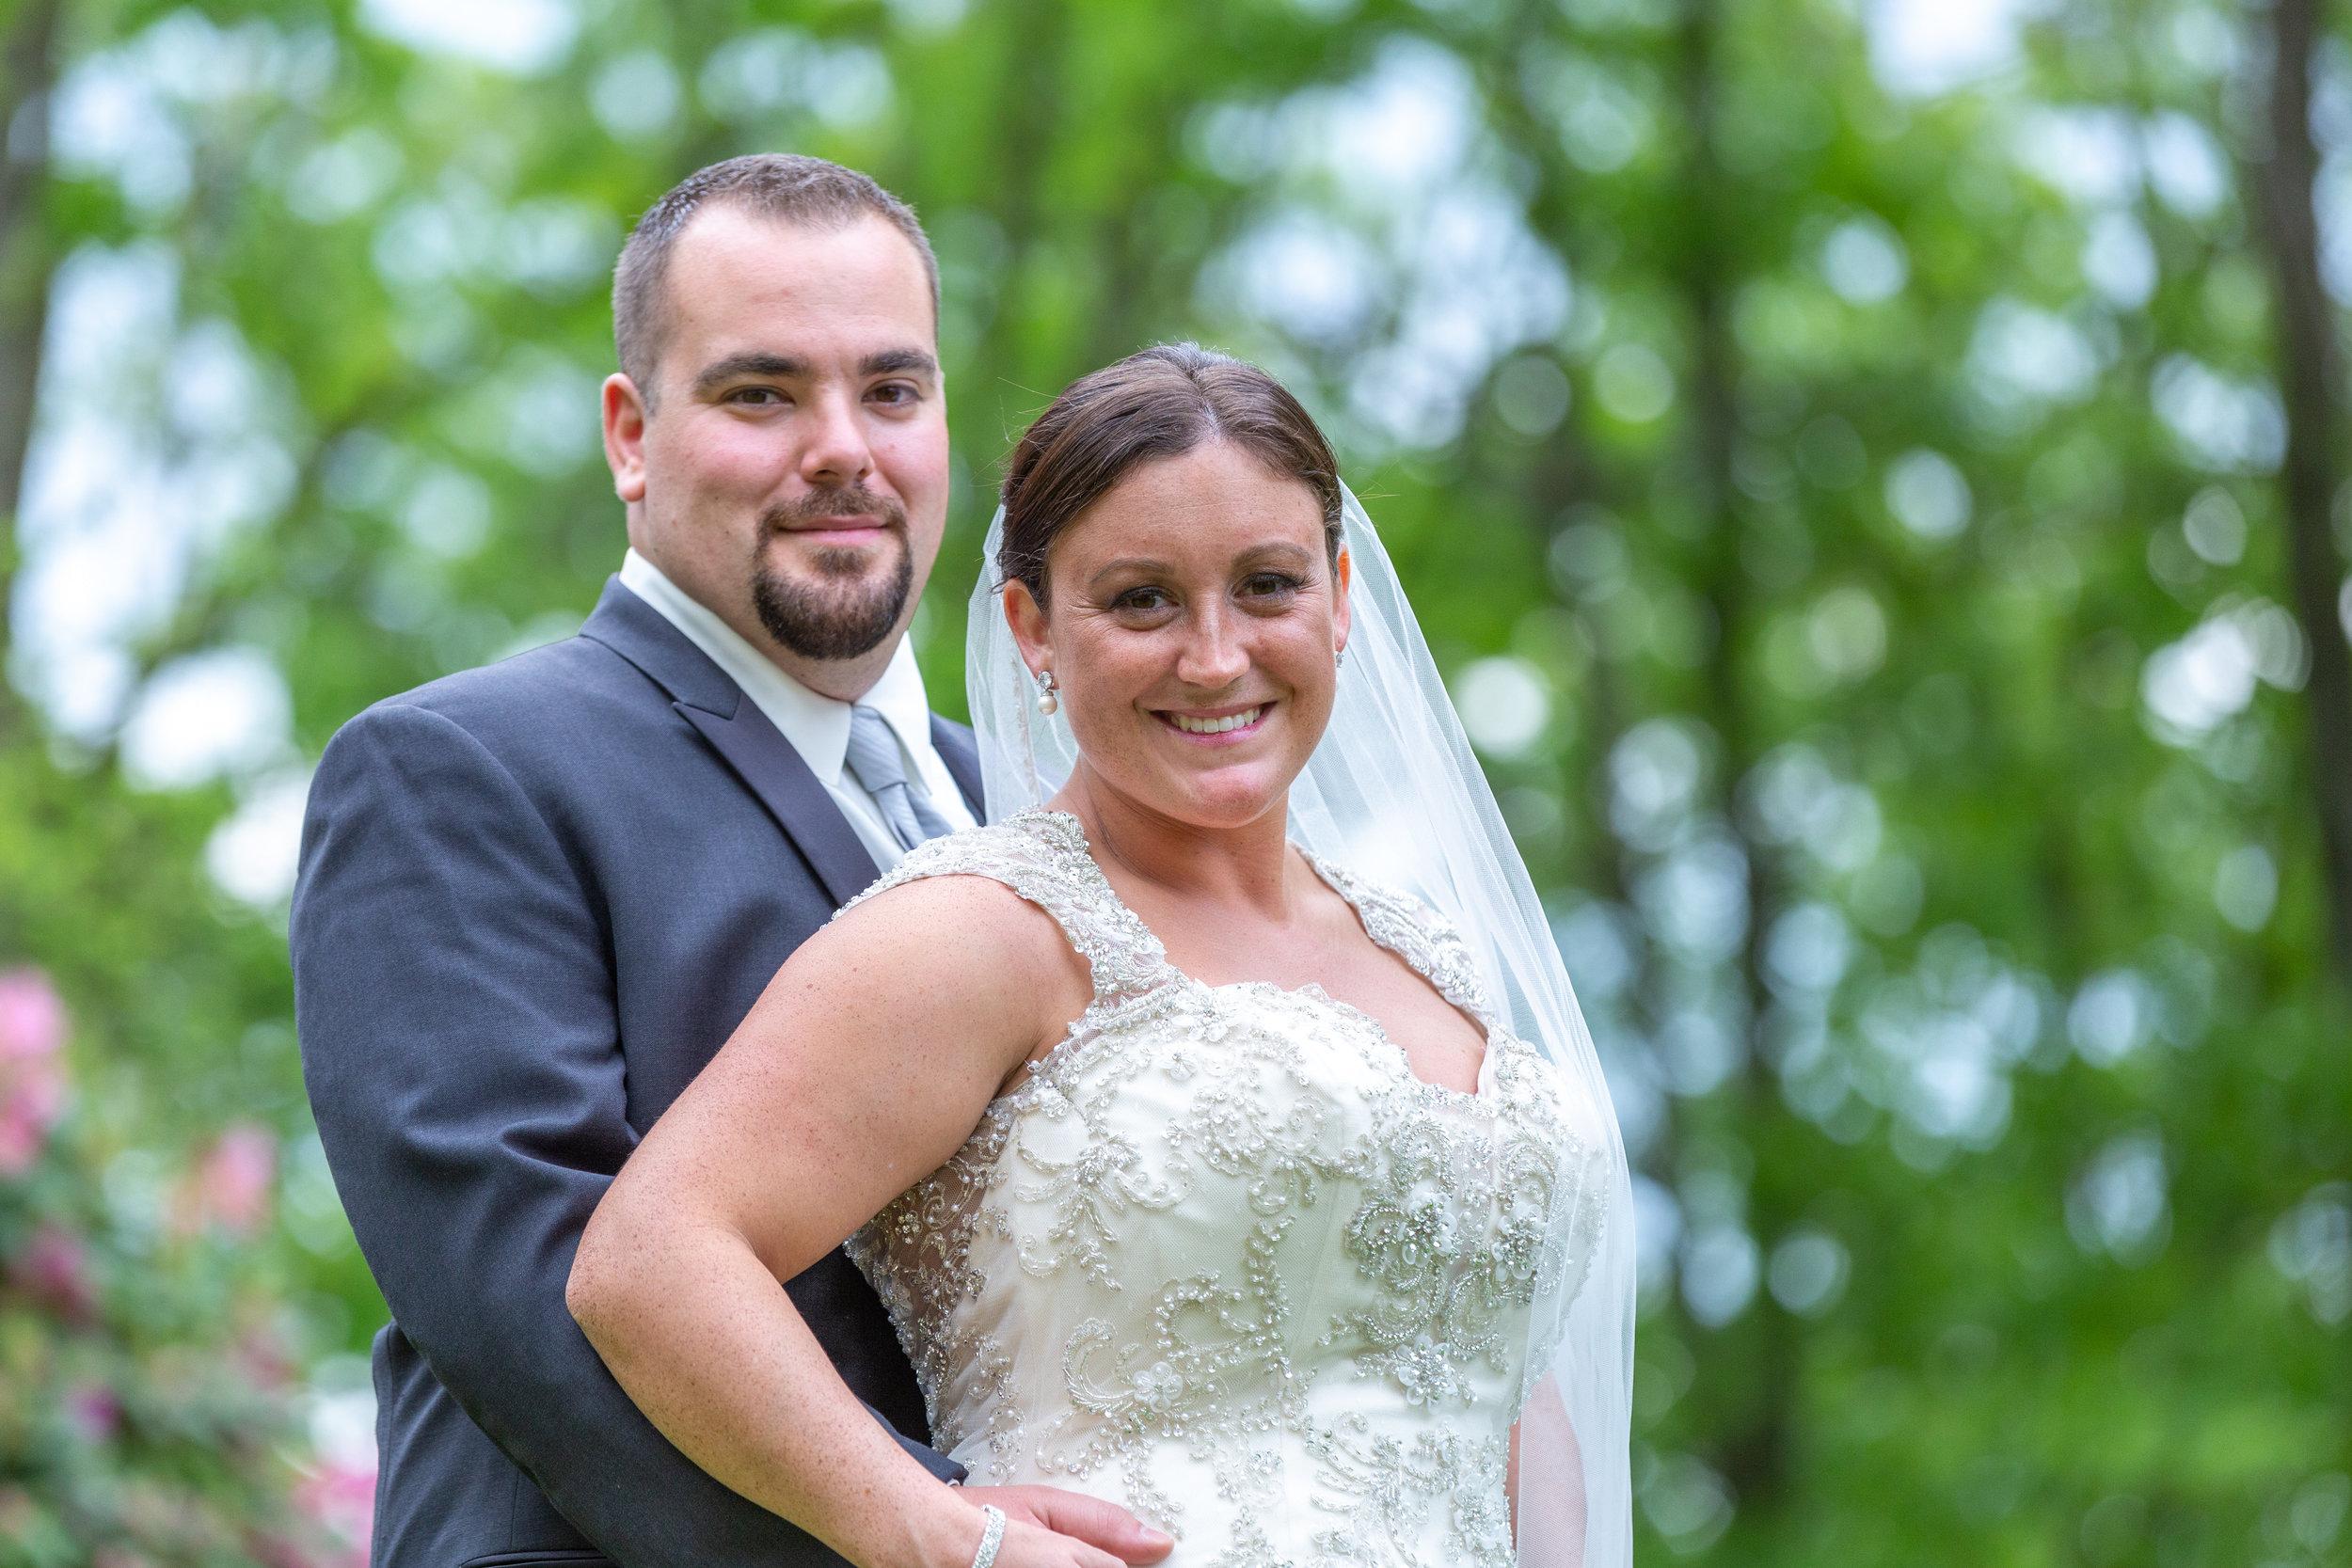 Mr. & Mrs. Atherholt - May 25, 2019